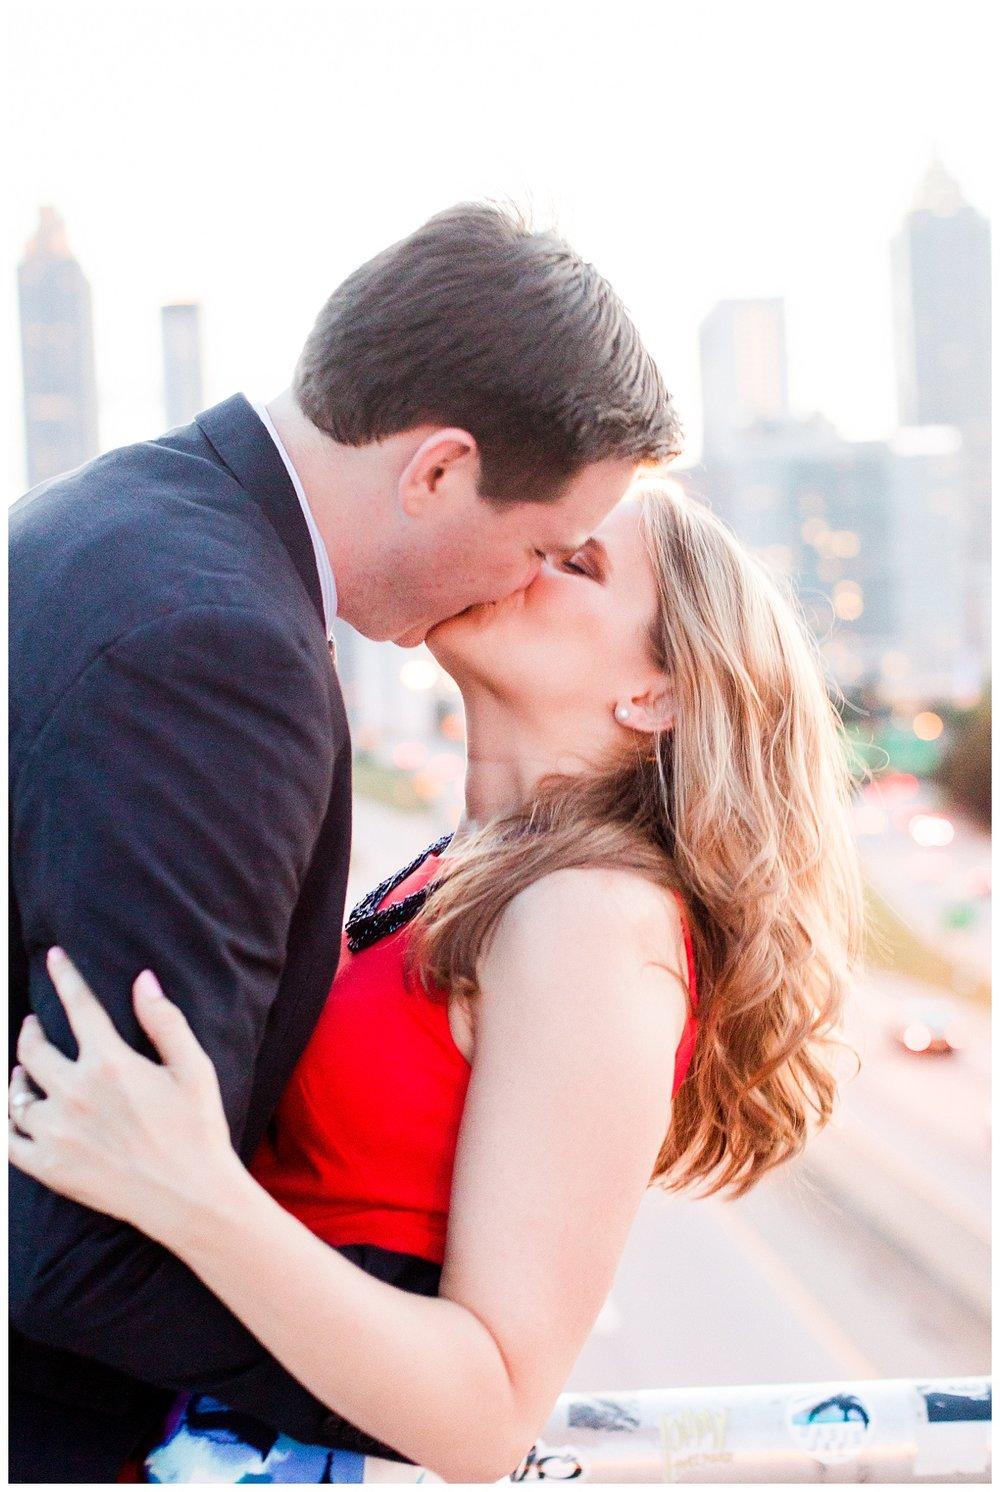 Engagement Pictures_KIm and Hamish_Abby Breaux Photography_Atlanta_Ponce City Market_Jackson Street Bridge_0066.jpg